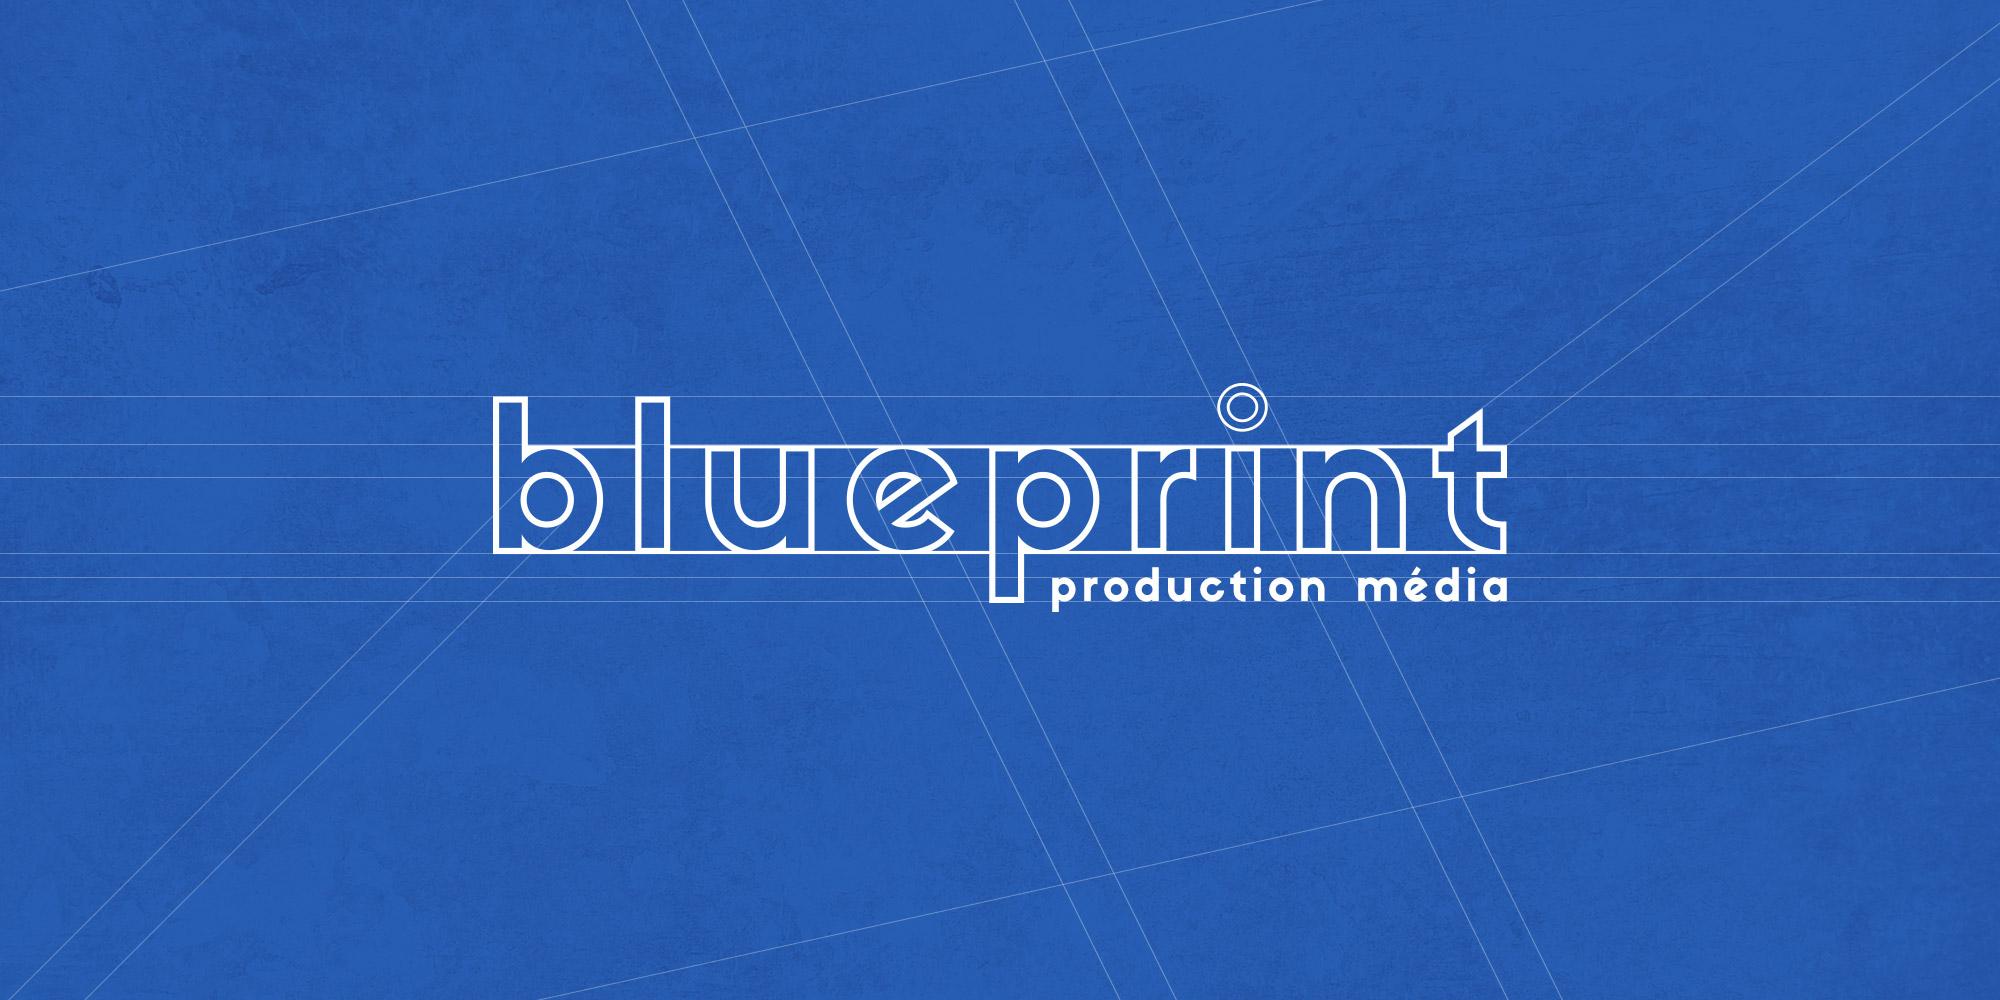 (c) Blueprint.pm